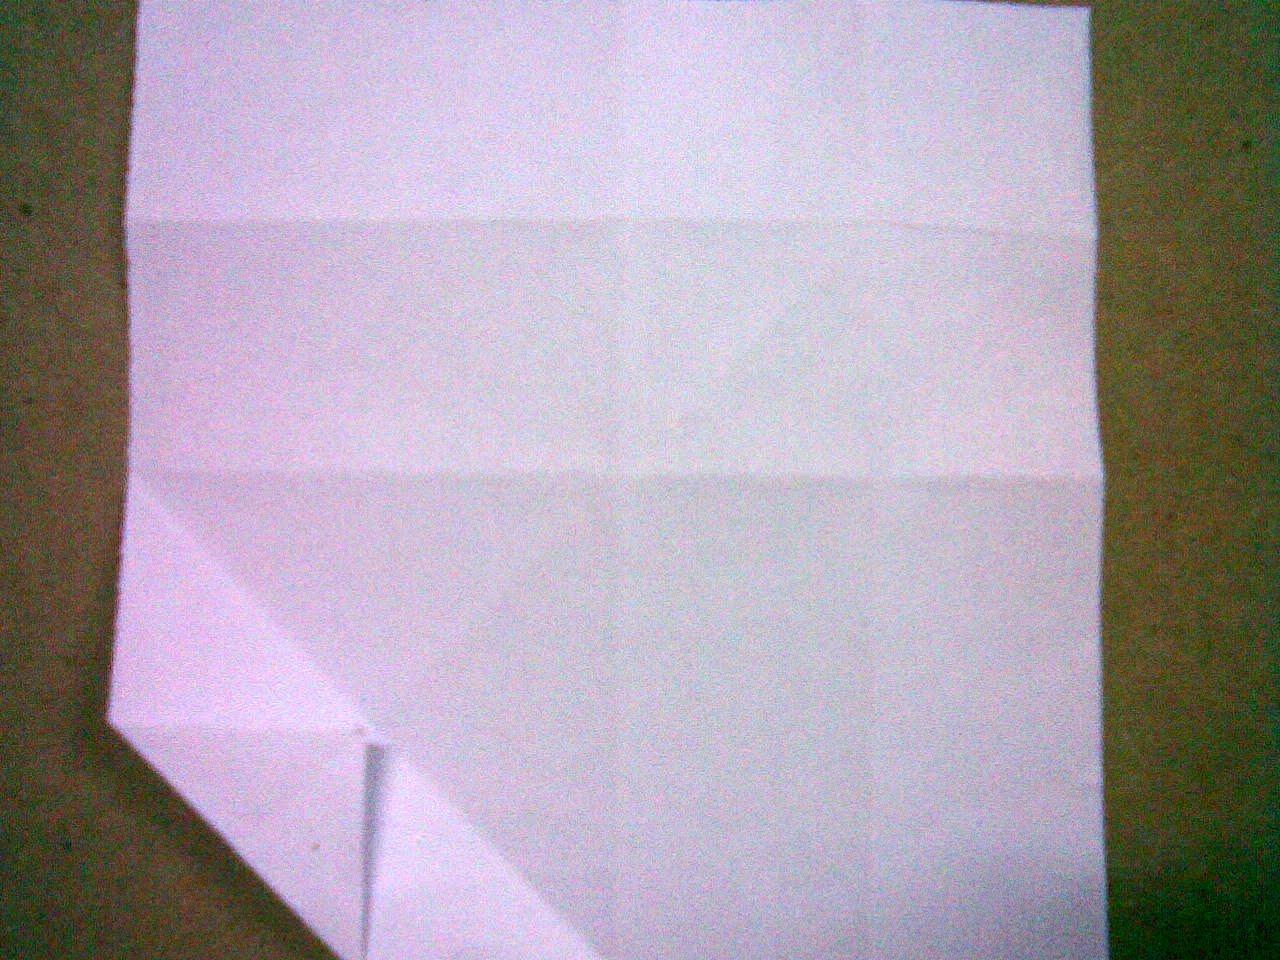 paper cut,cut paper fold,fold paper box cover lid,reuse,recycle,plastic bag,crafts